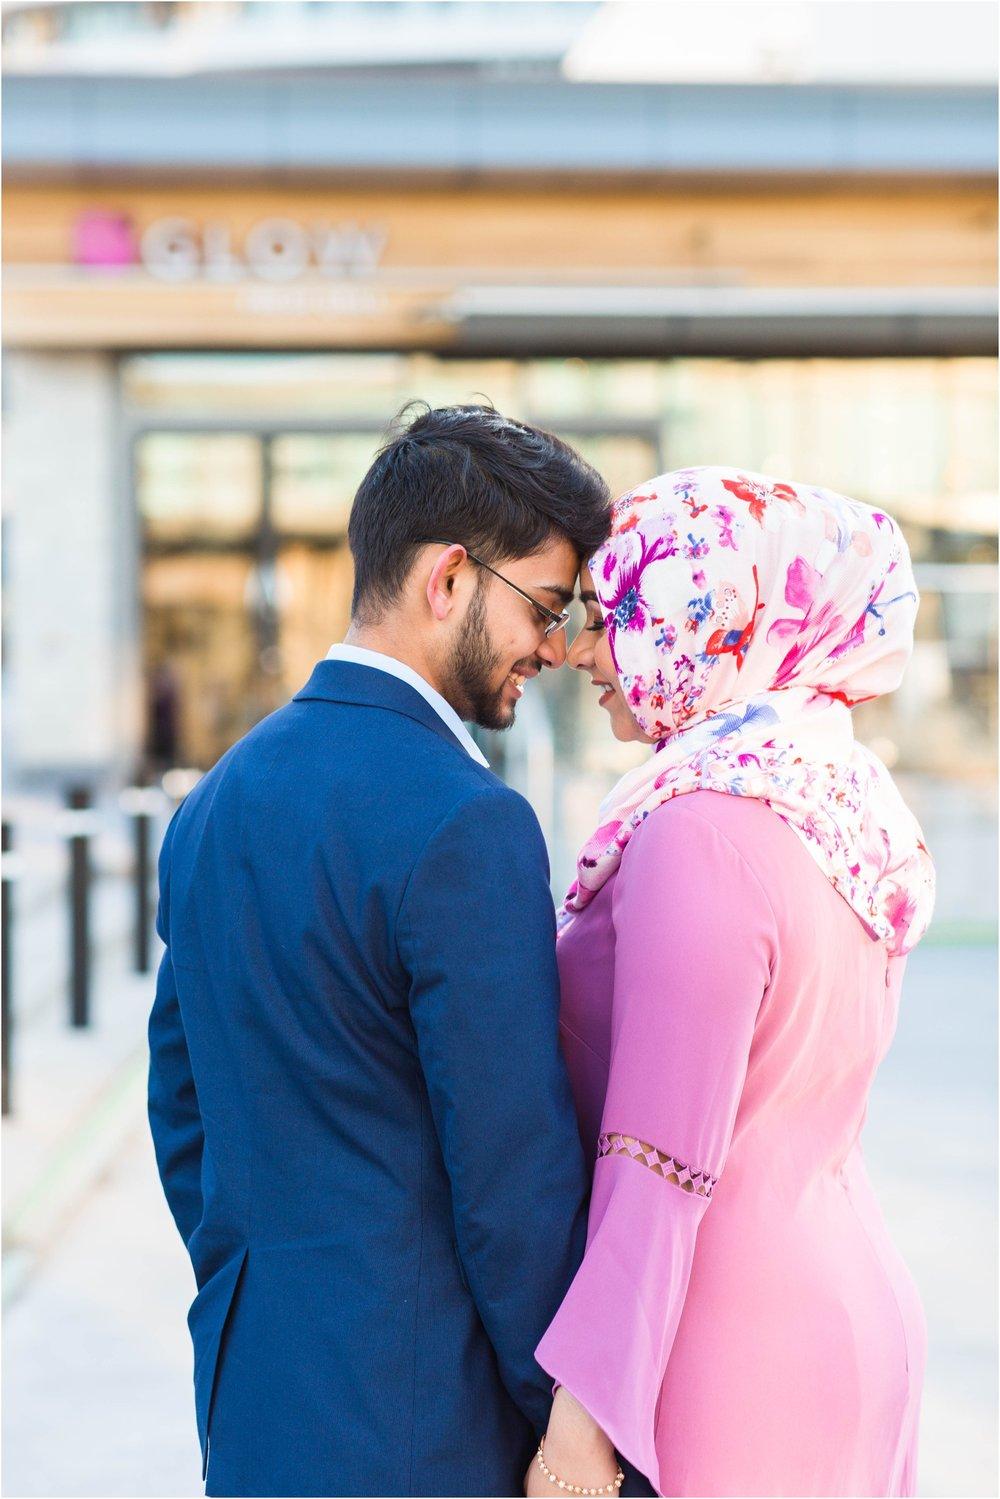 Shops-at-Don-Mills-Engagement-Session-Toronto-Mississauga-Brampton-Scarborough-GTA-Pakistani-Indian-Wedding-Engagement-Photographer-Photography_0025.jpg